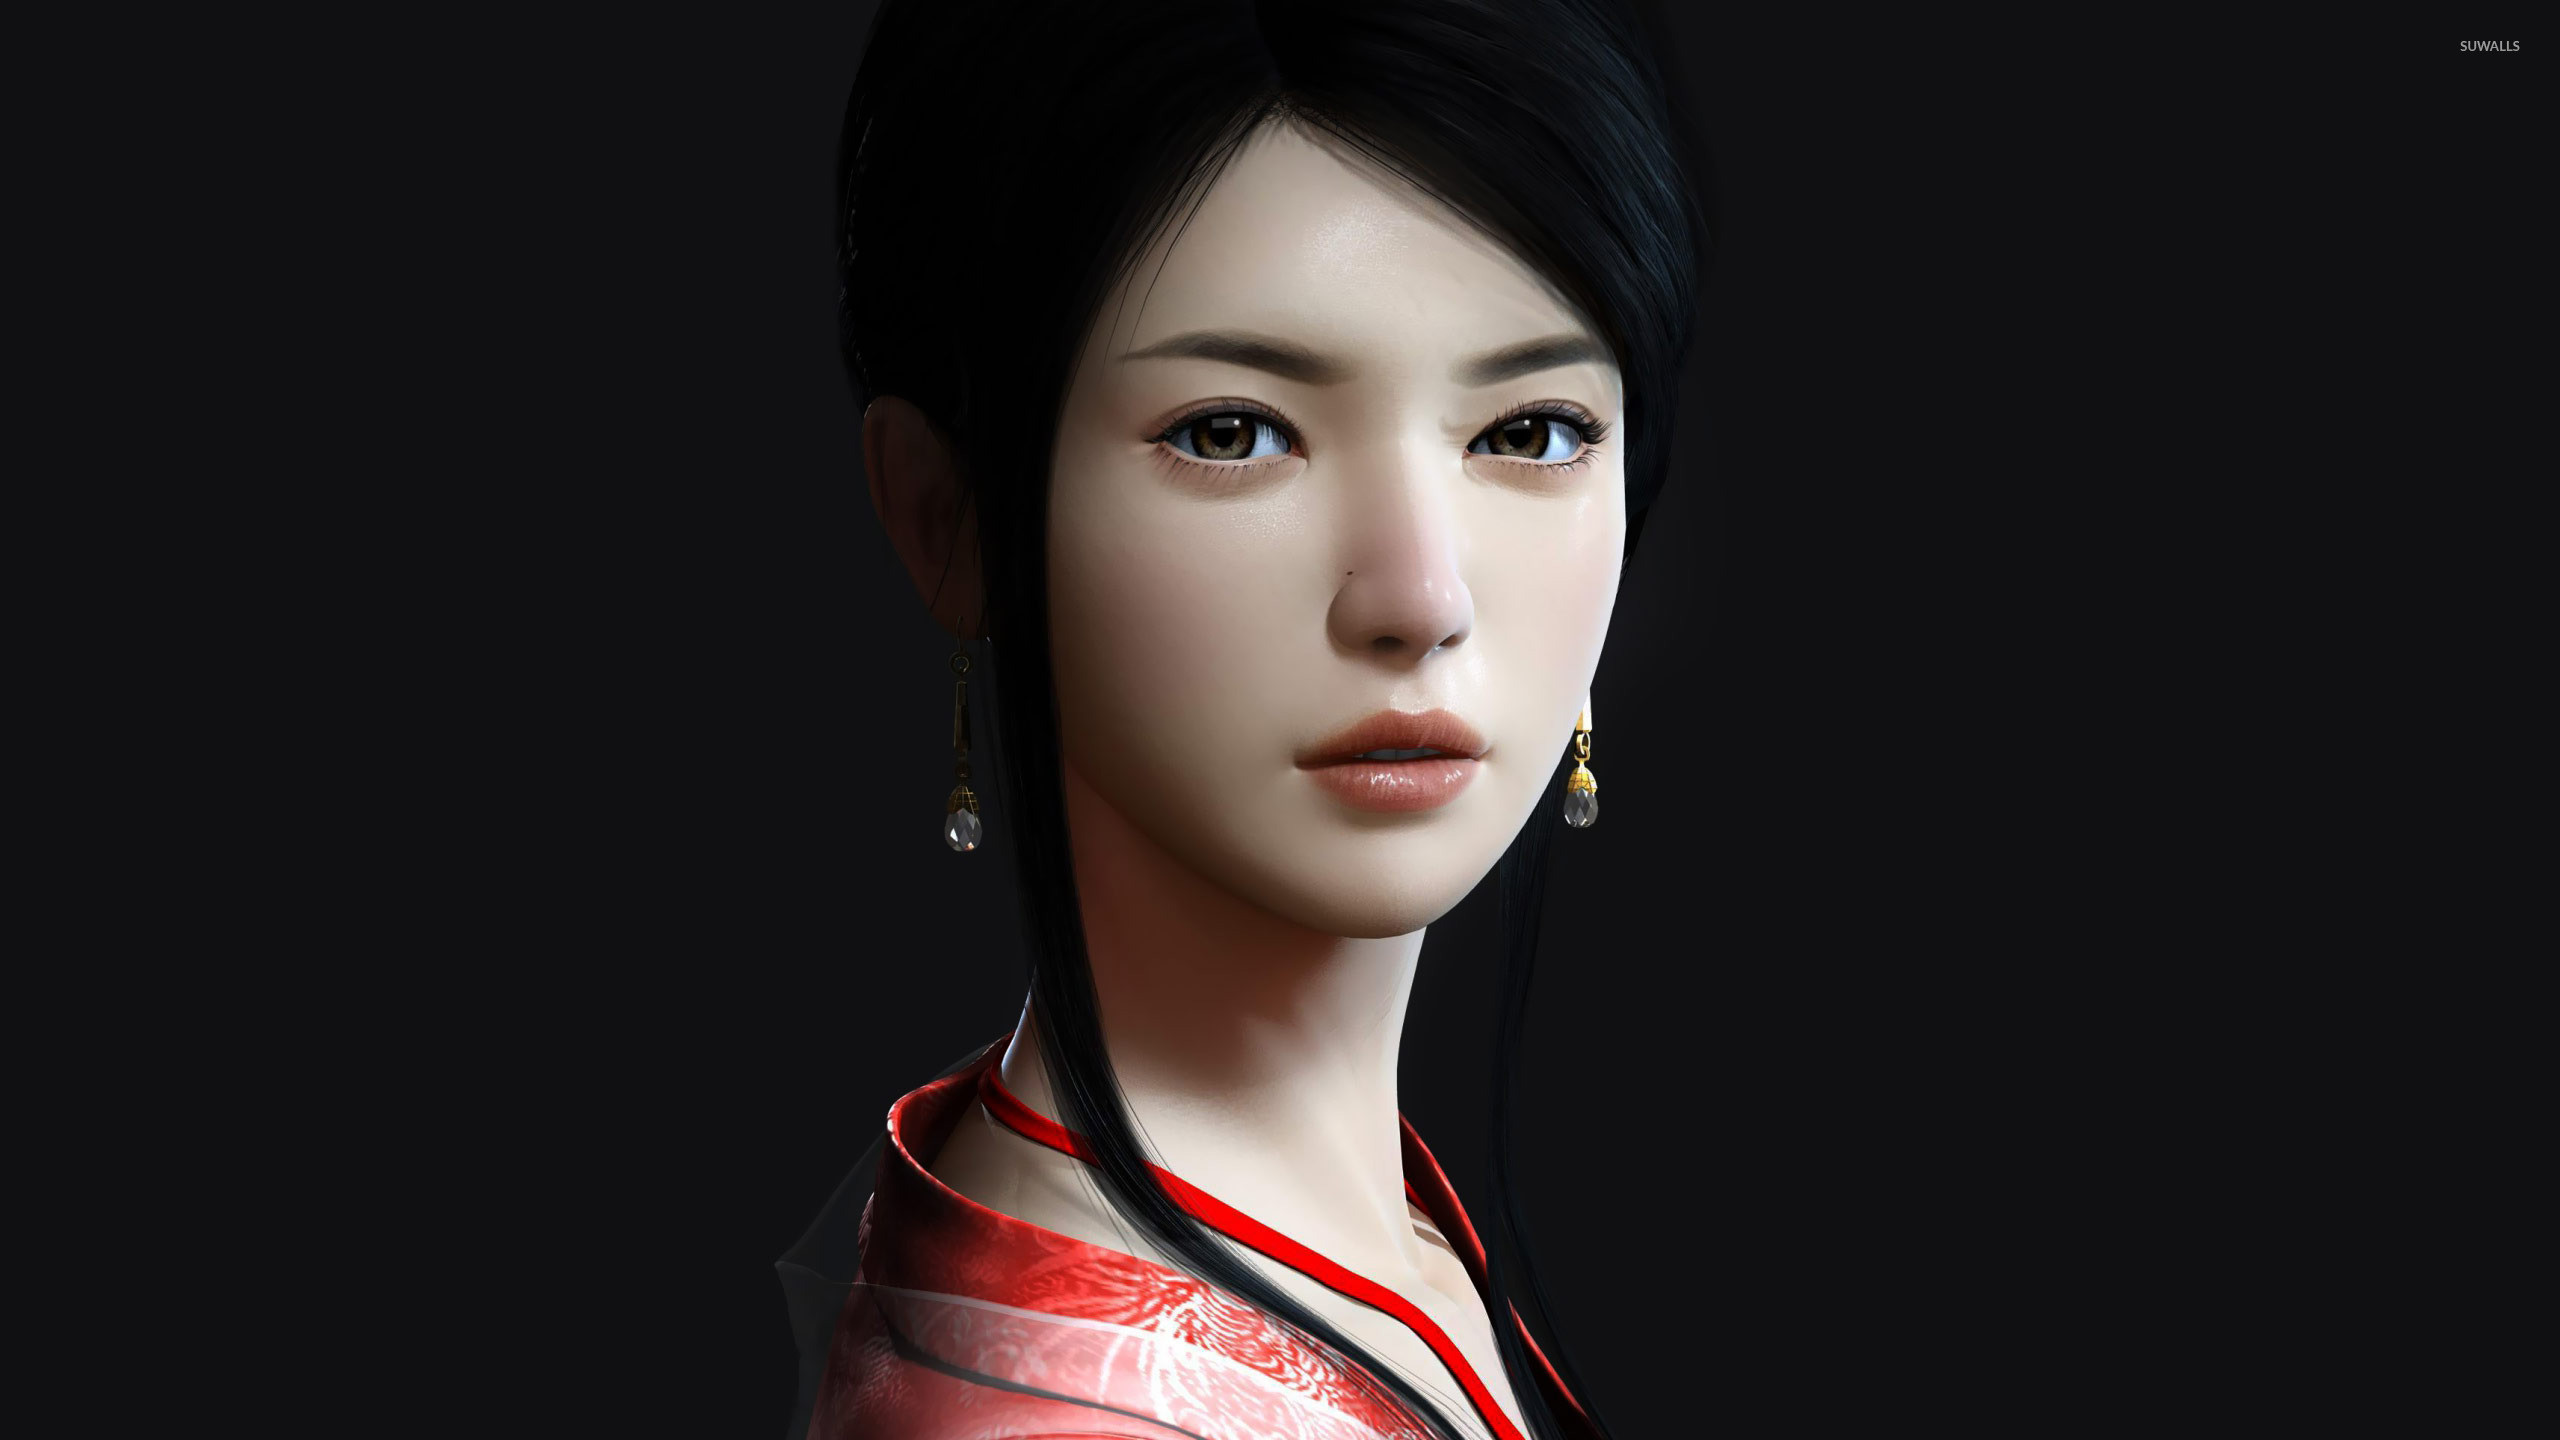 Asian woman wallpaper jpg